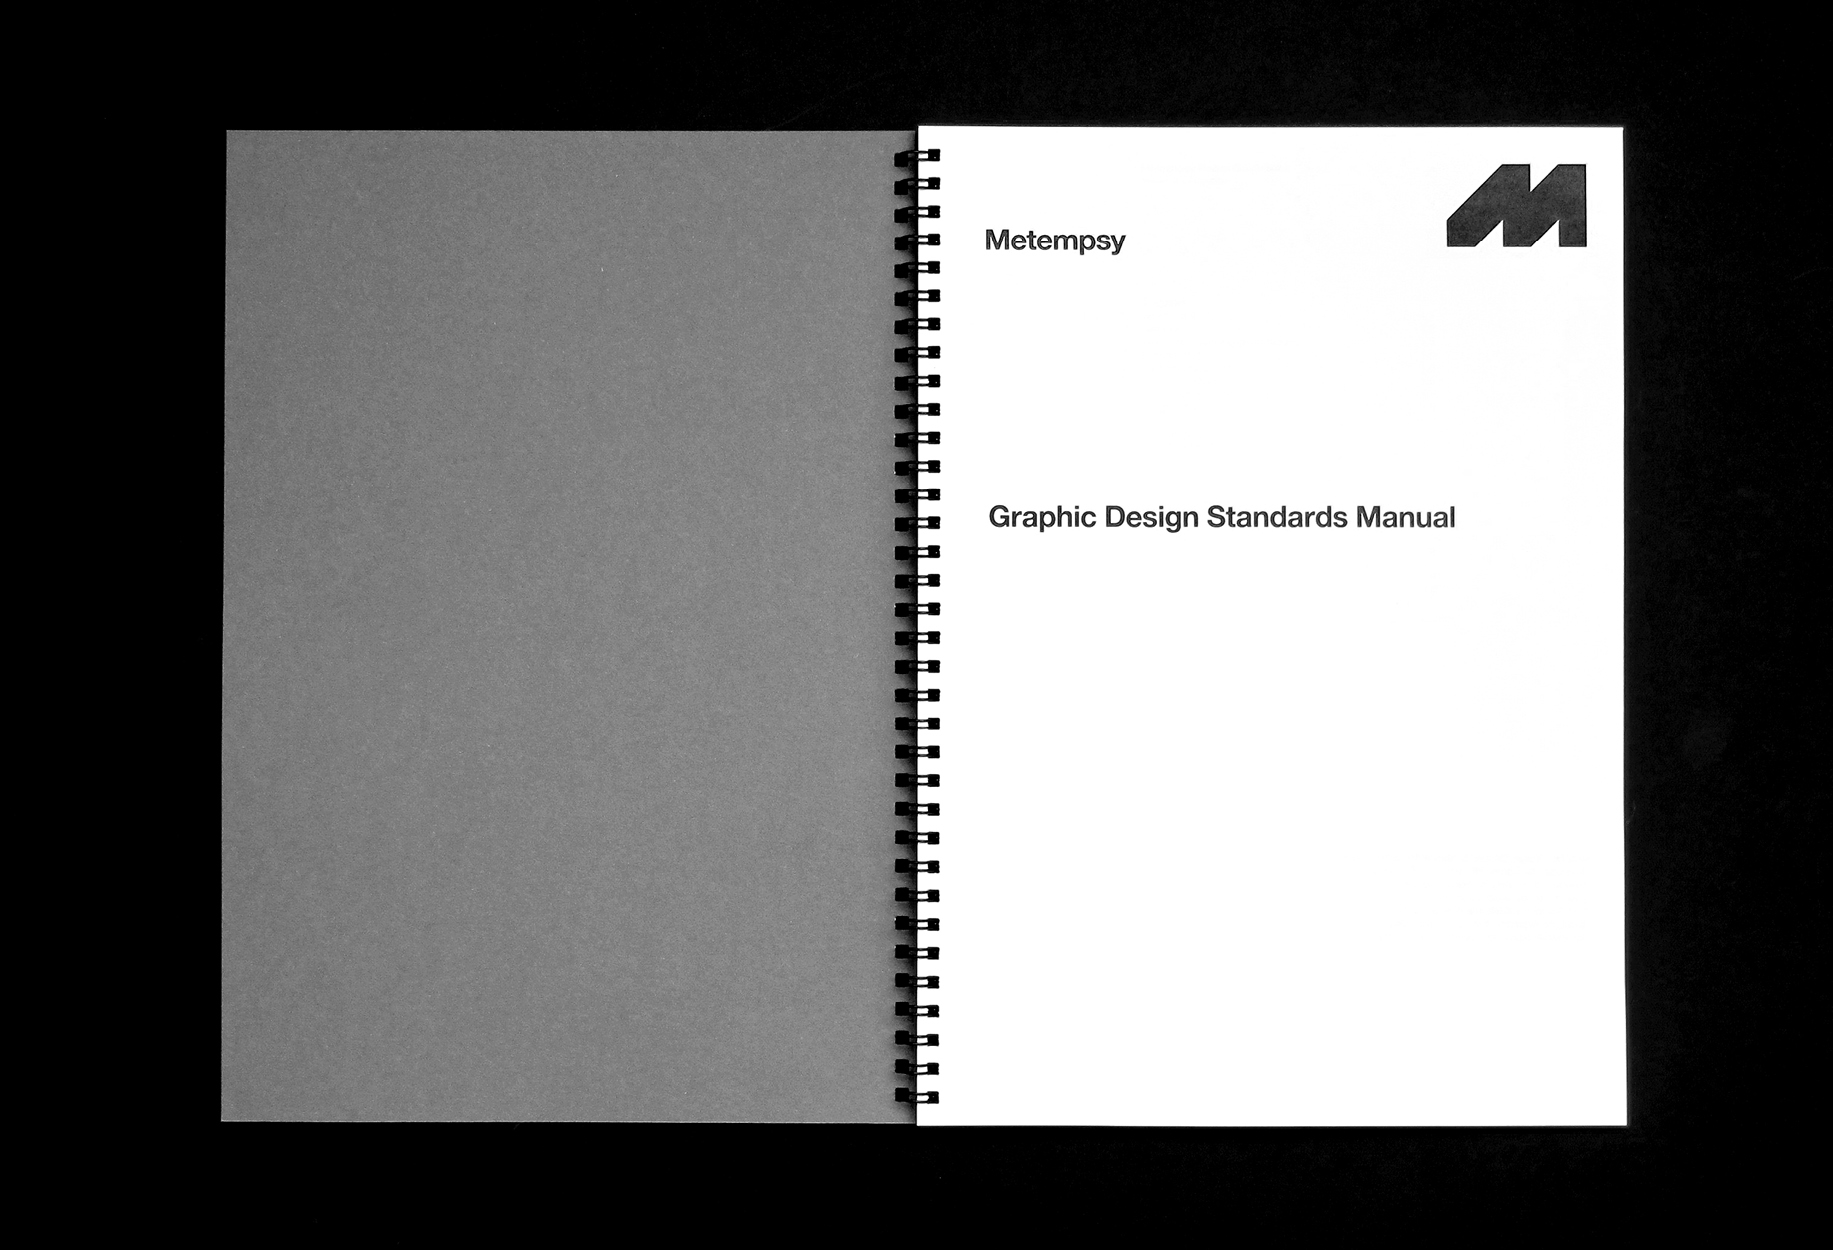 Metempsy-Graphic-Design-Standards-Manual-2.jpg